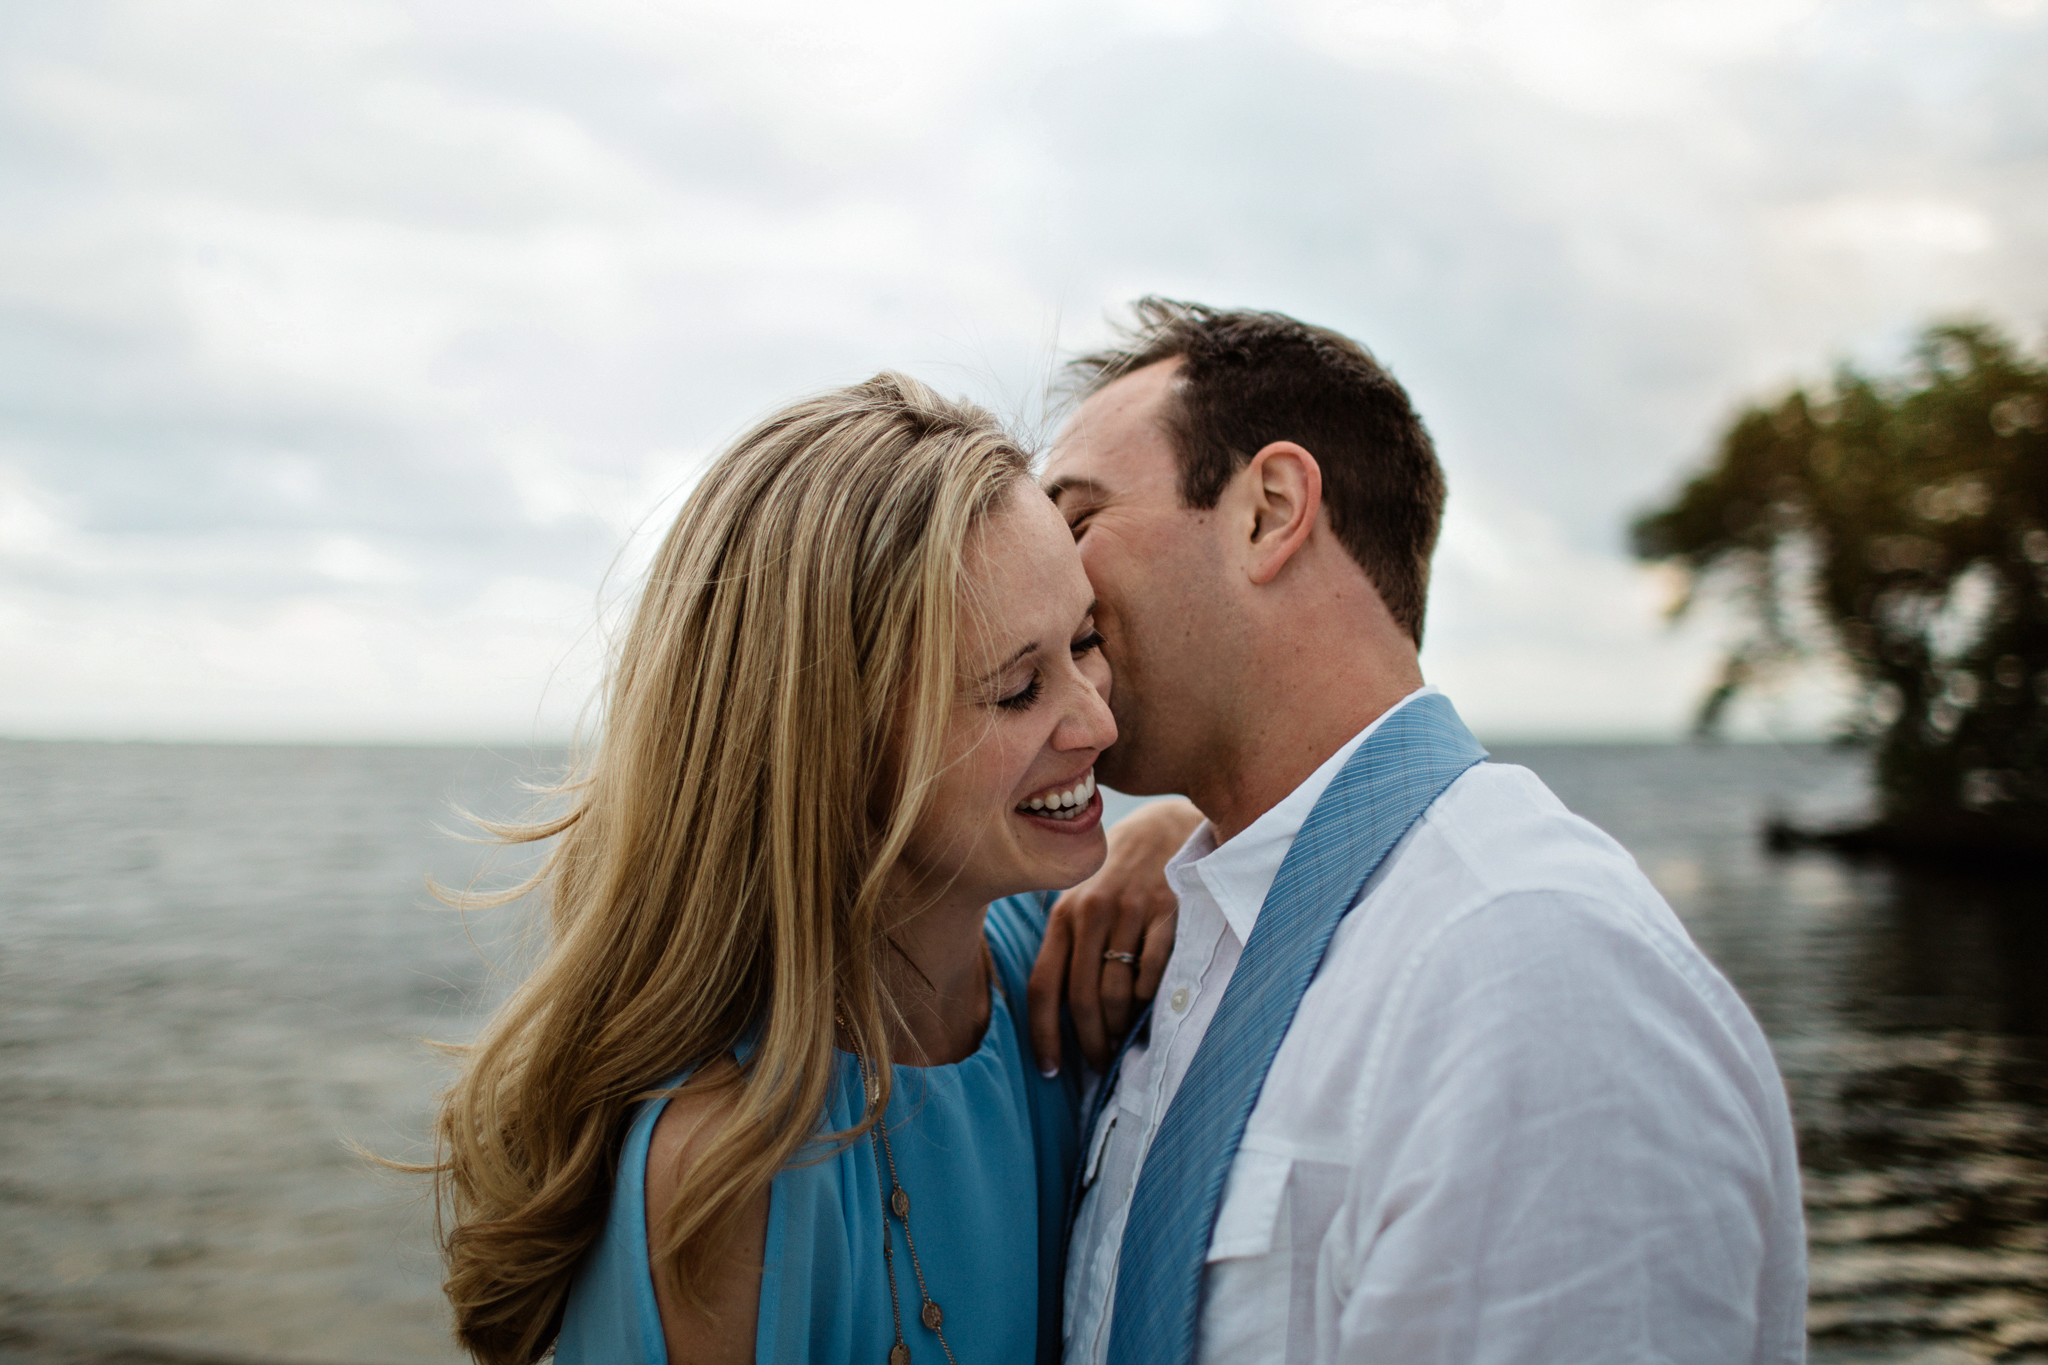 Jonathan&BrittanyEngagementSOCIALMEDIA-14.jpg